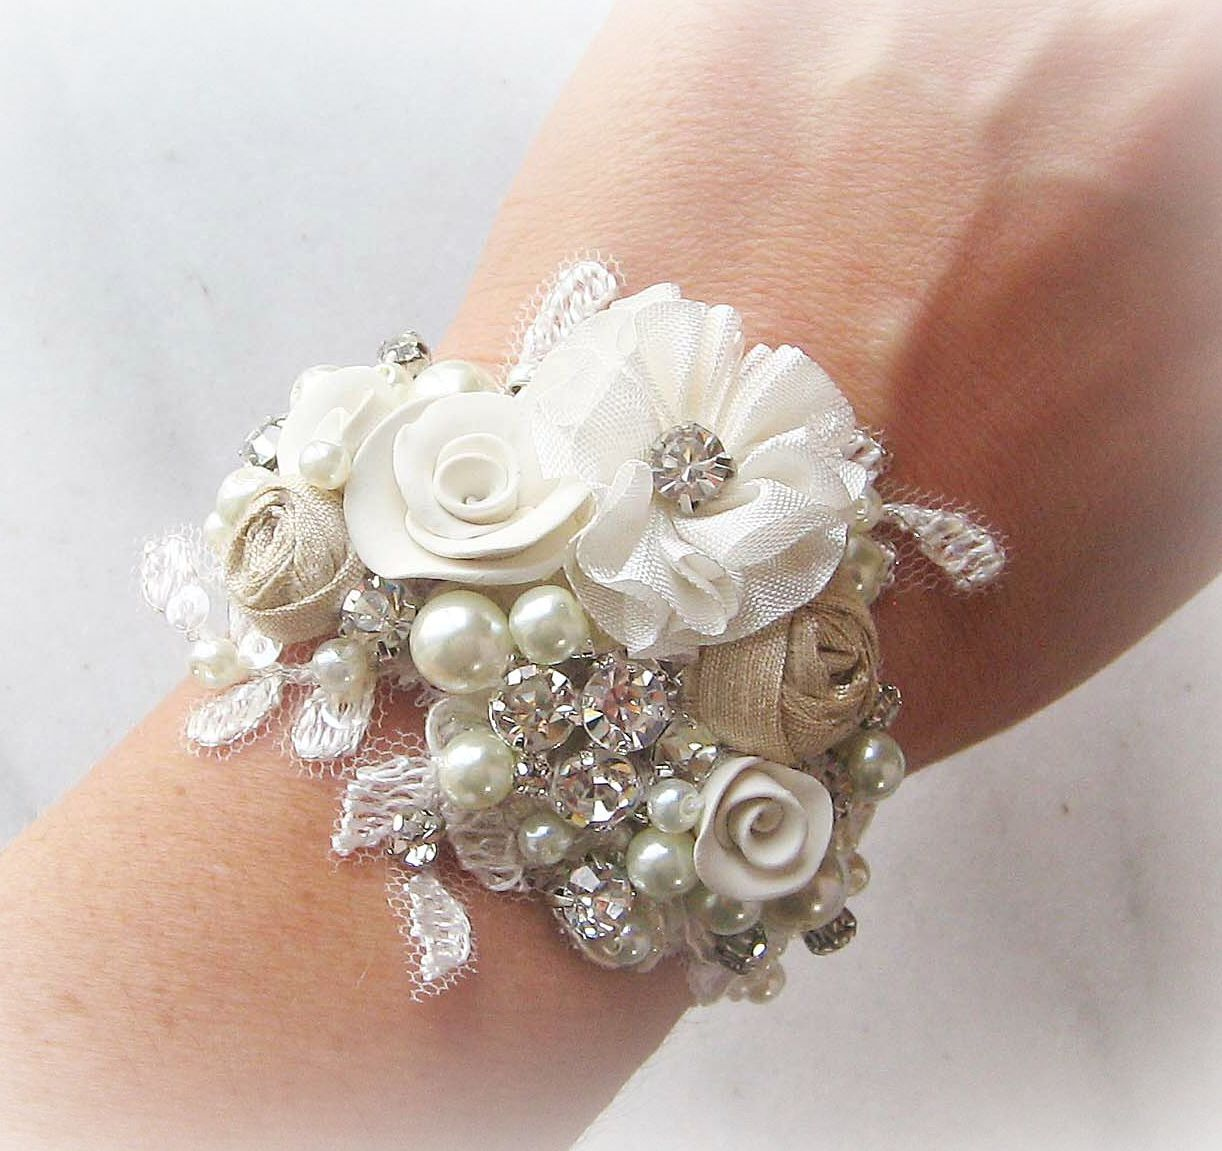 Vintage Style Bridal Cuff Wrist Corsage Bracelet Custom Rustic Wedding Rhinestone Pearl Promise